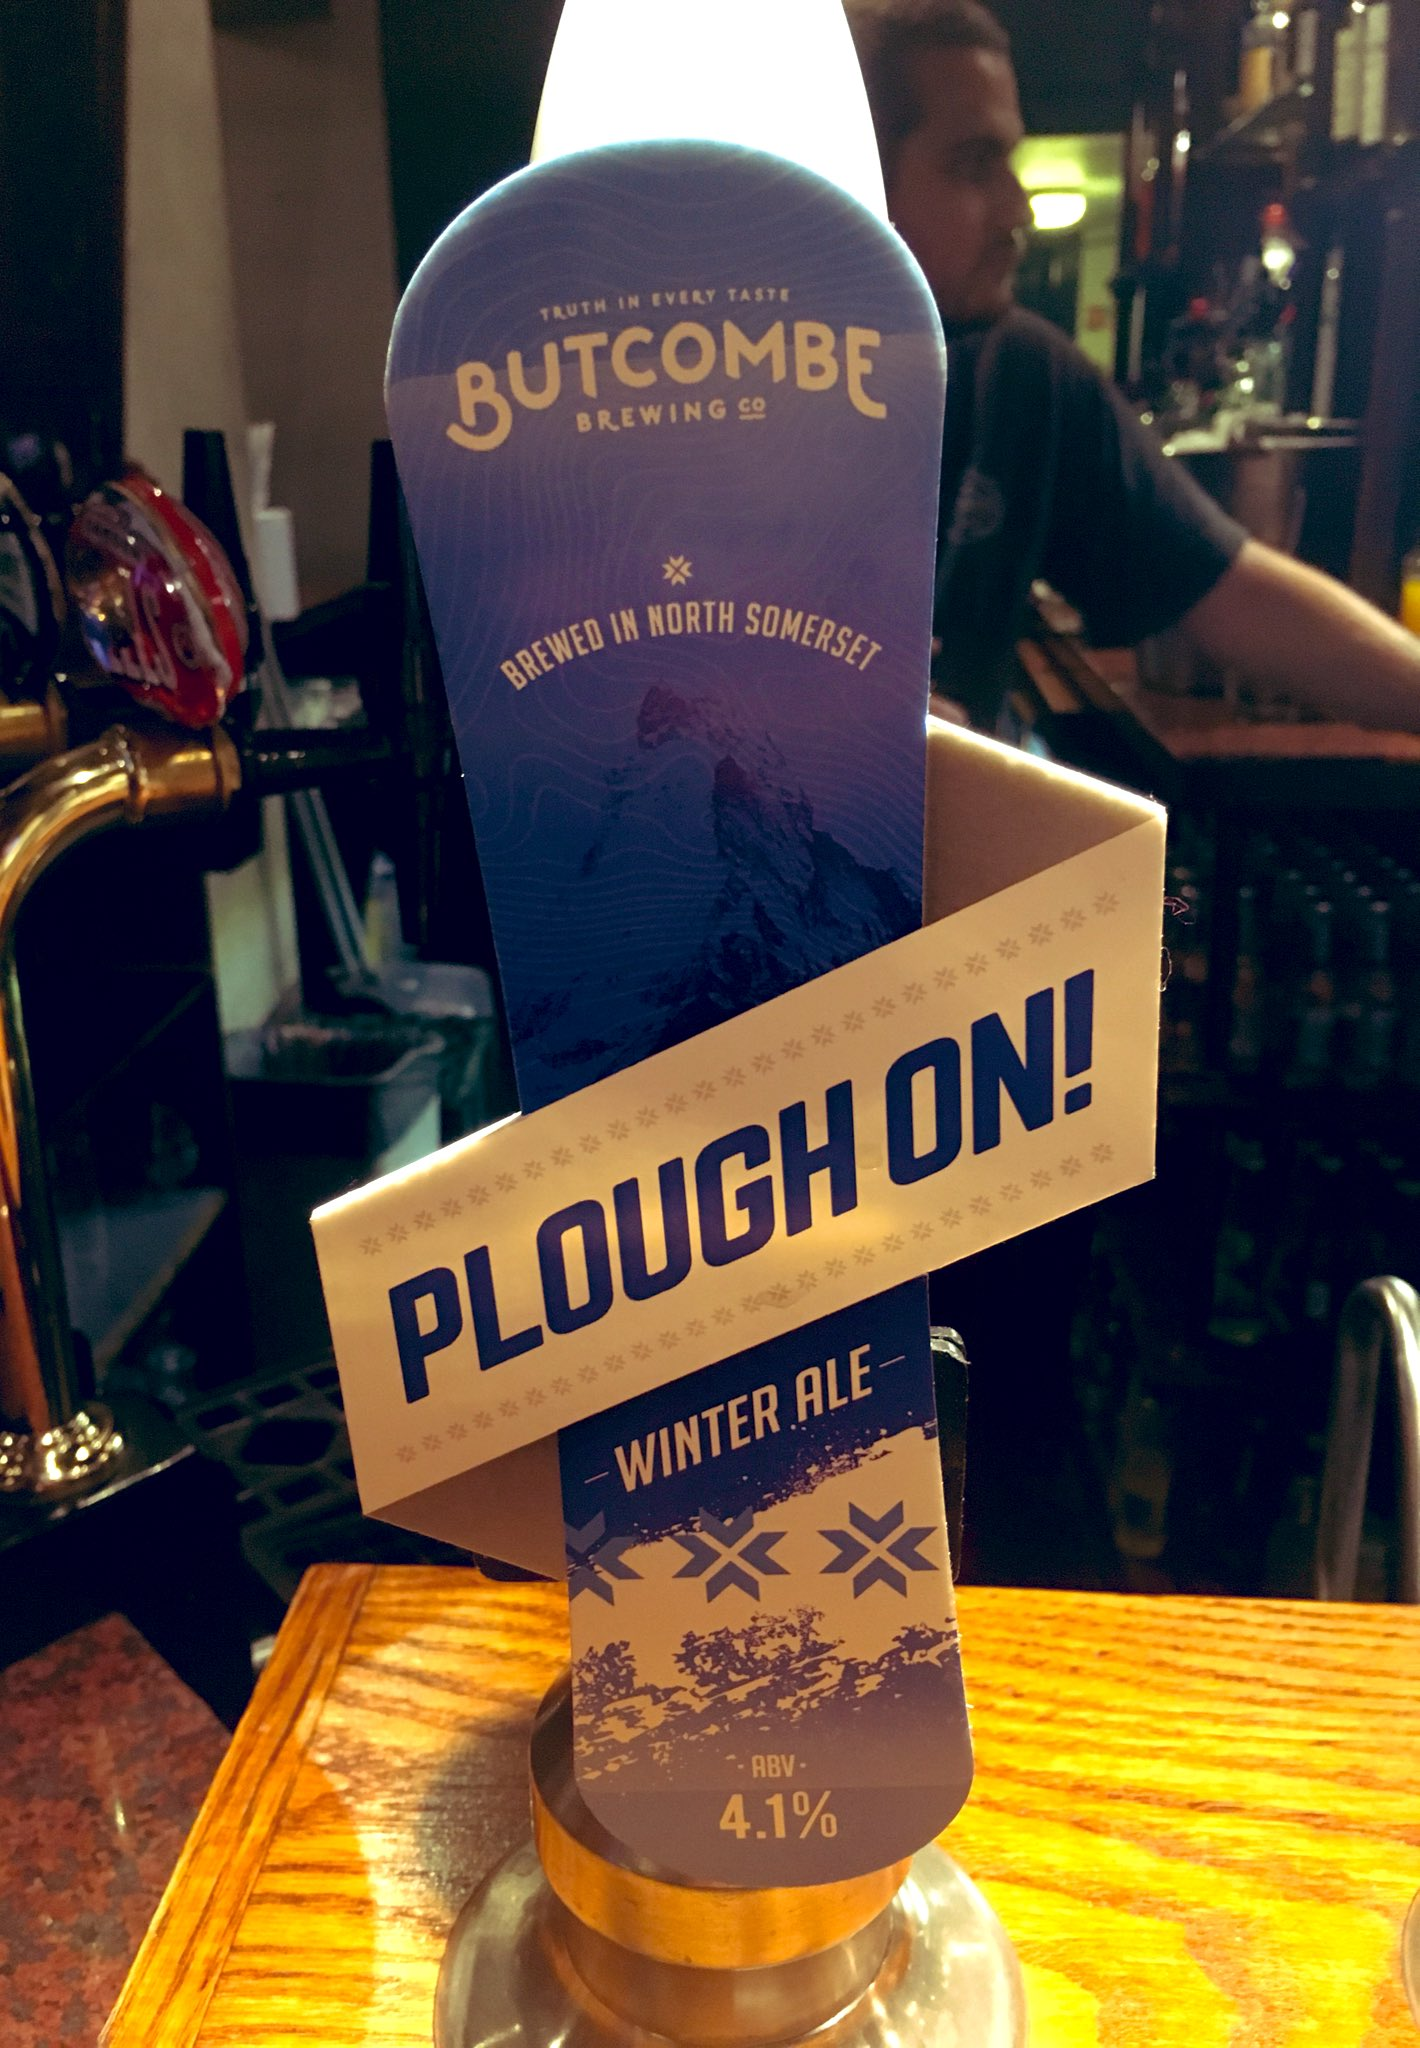 45: Plough On!